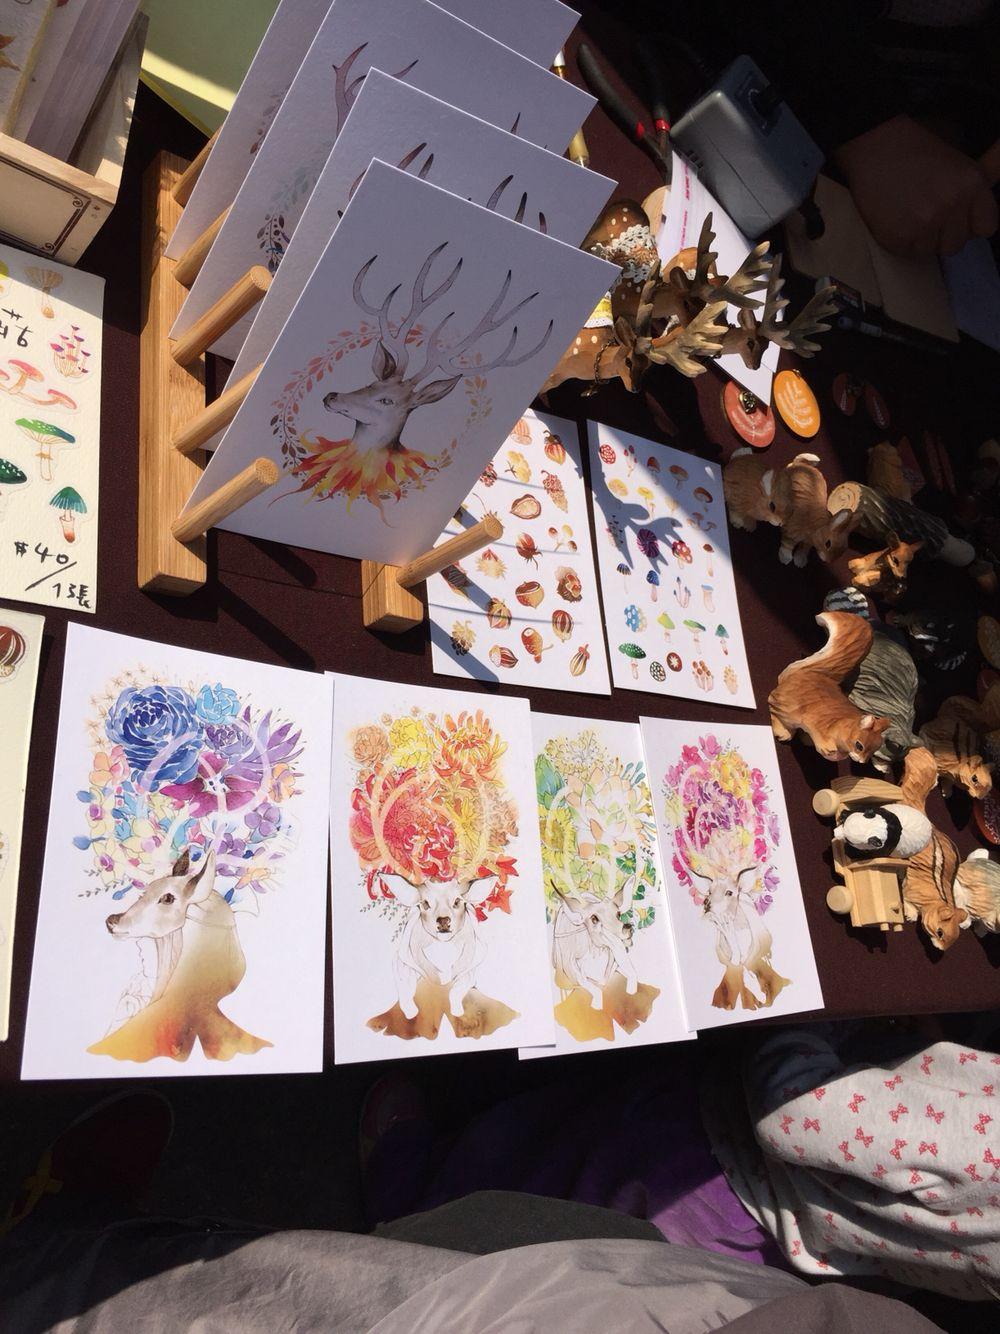 Watercolor cards up close (Taipei)